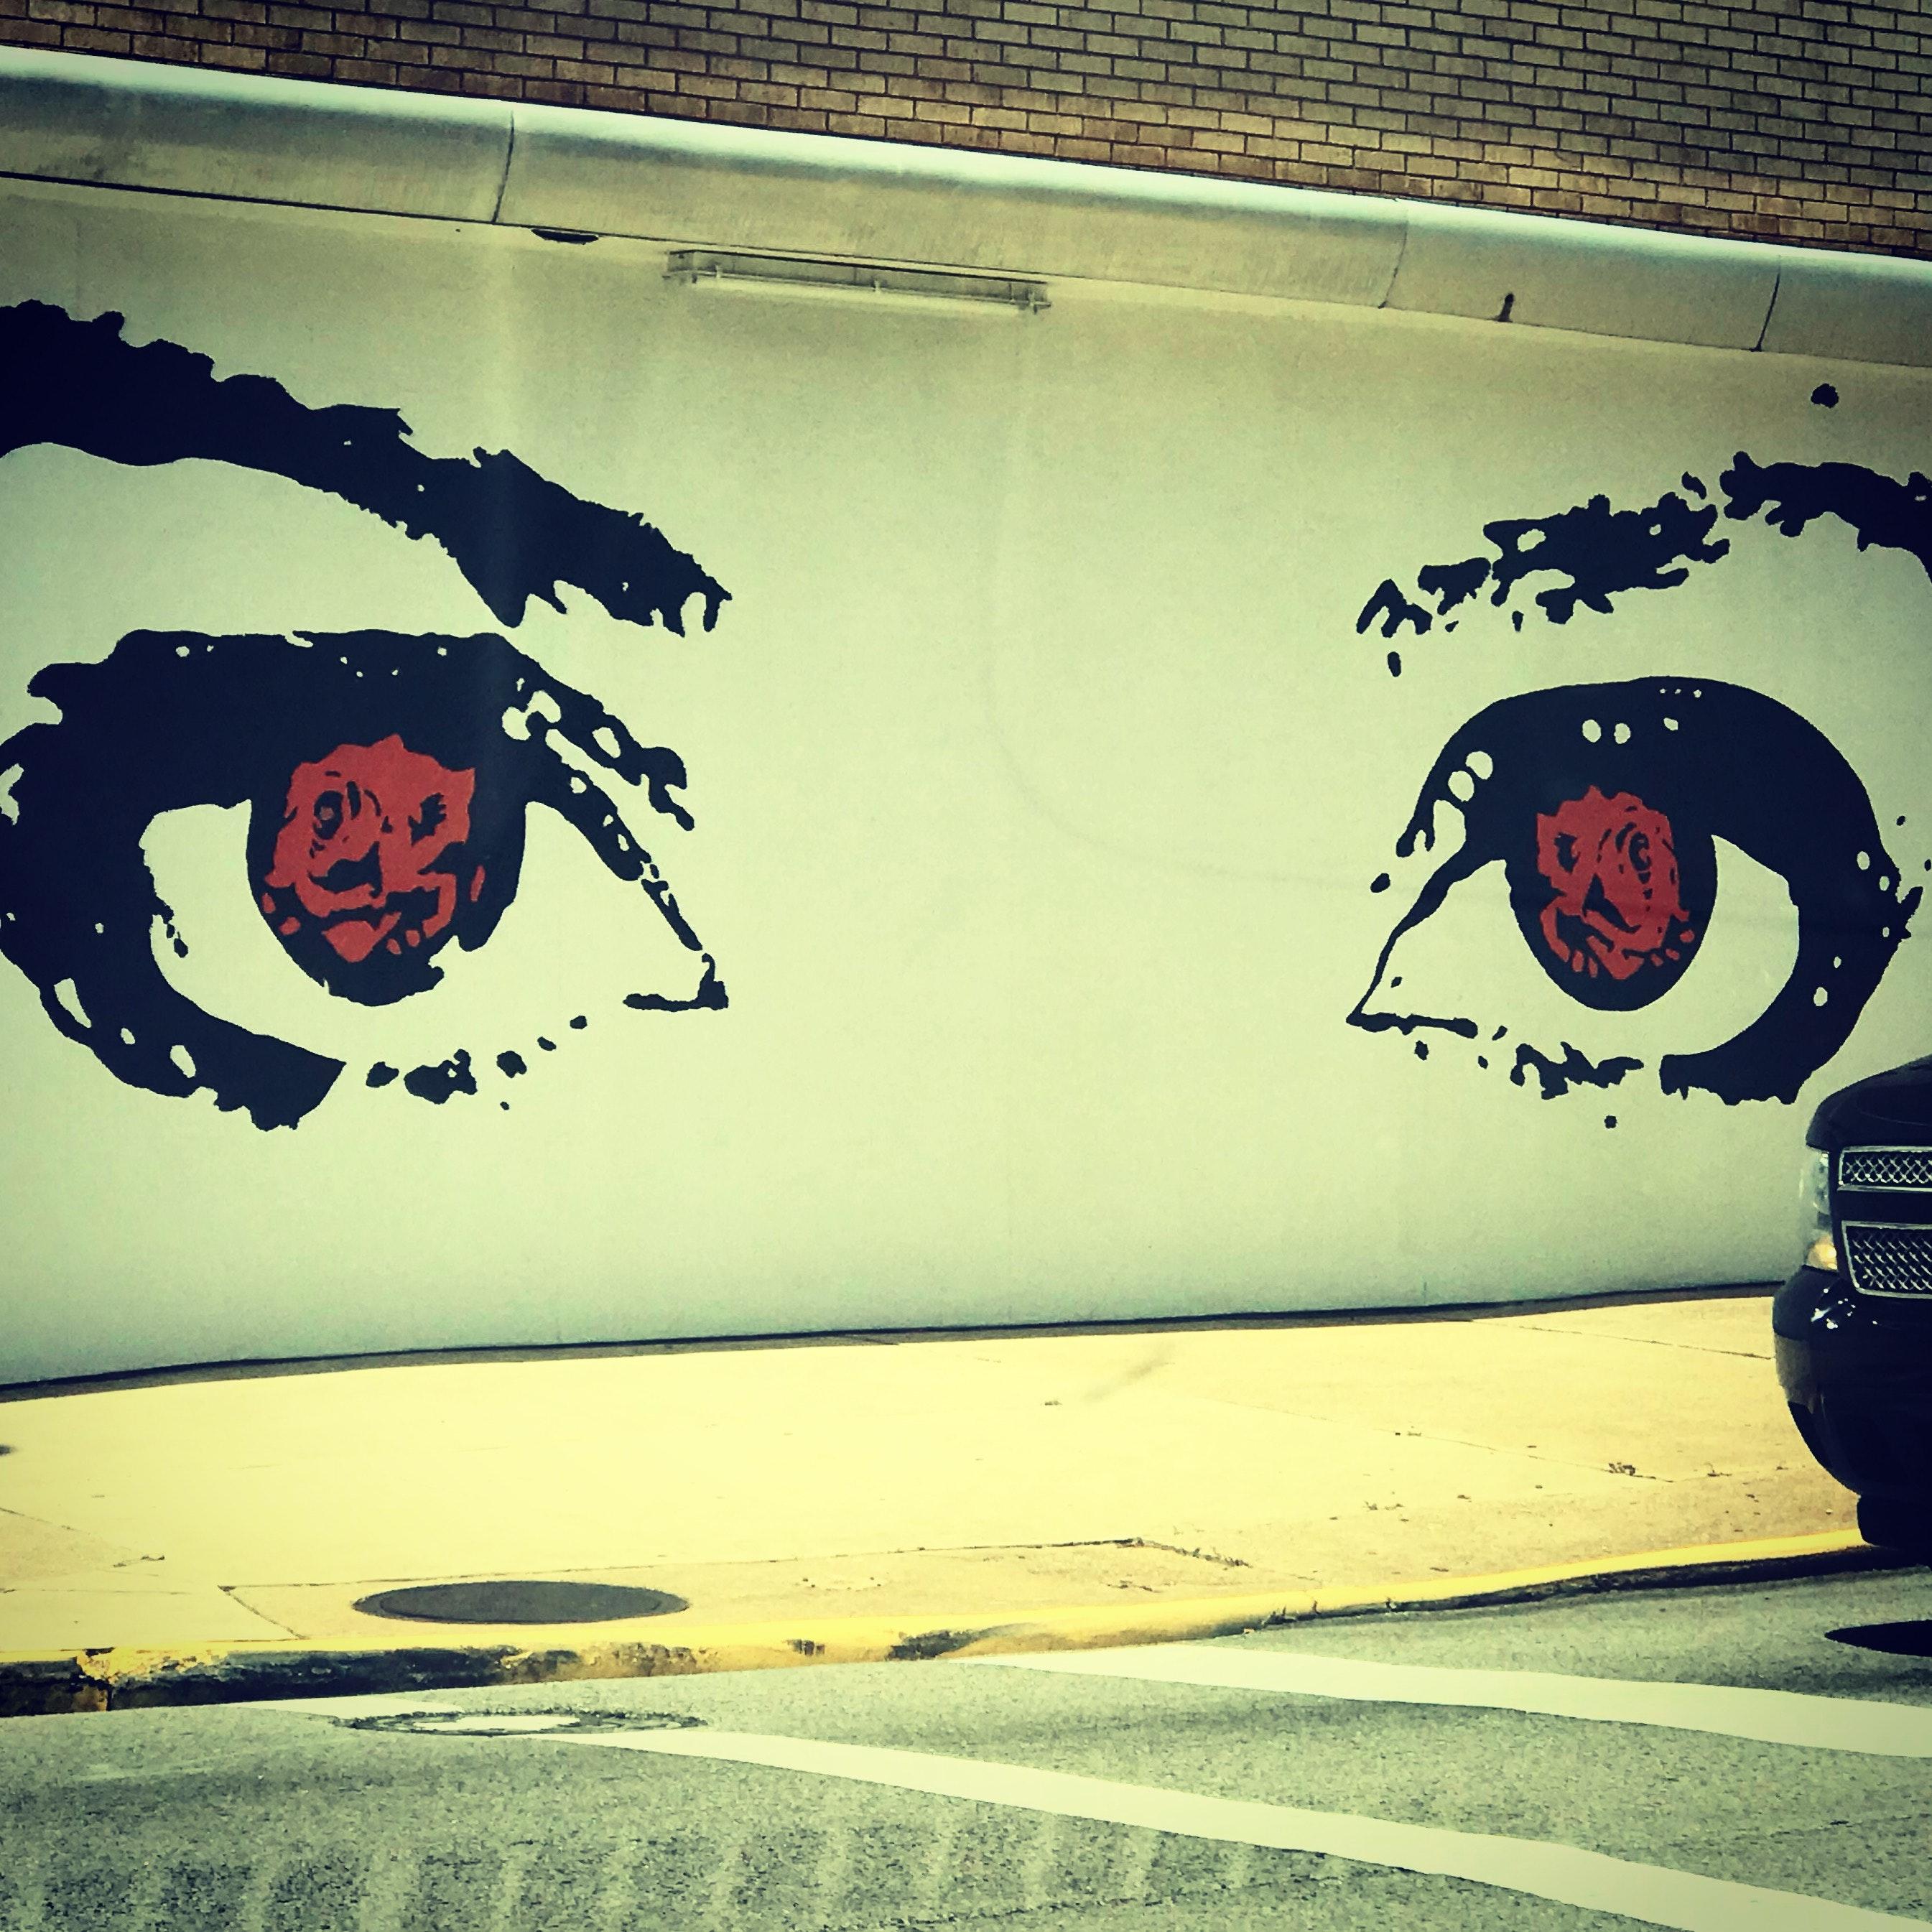 Free stock photo of wall art